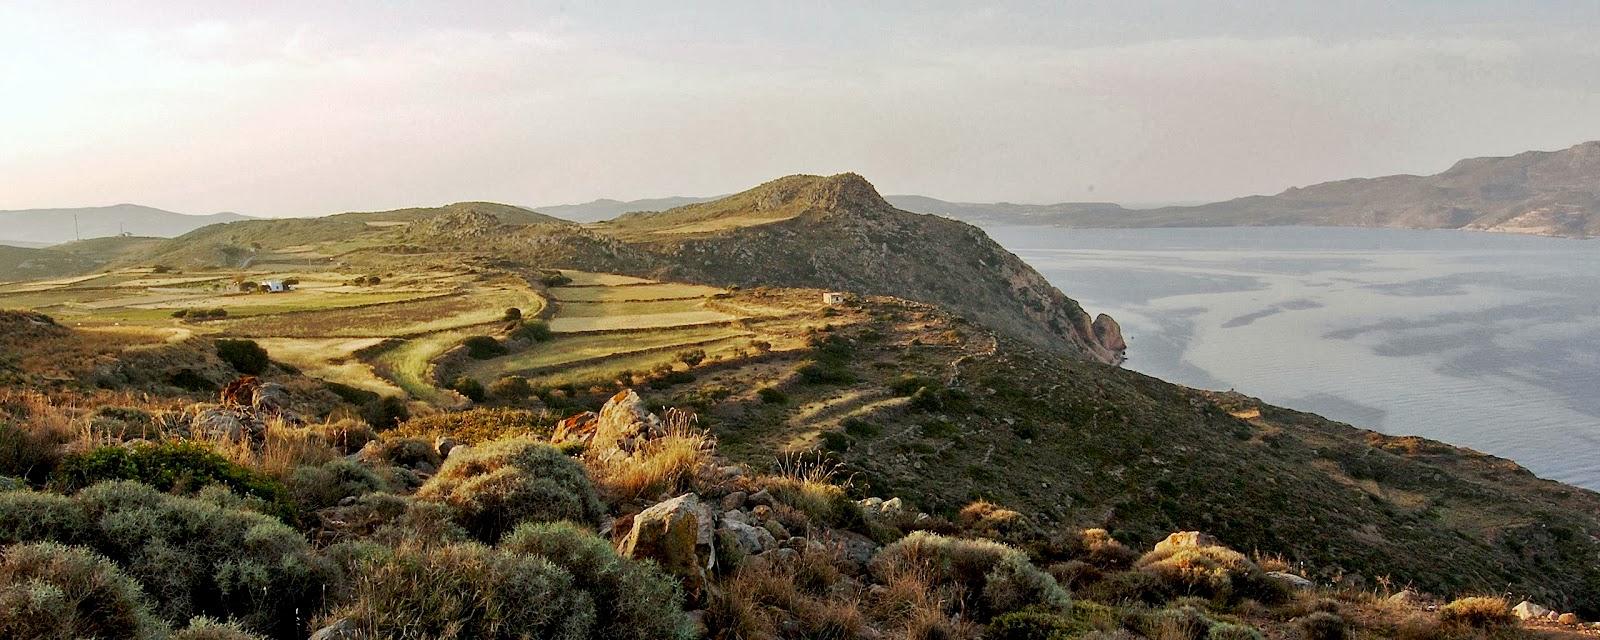 Vdeo gratis: Naturaleza, Paisaje, Ocano - Material de